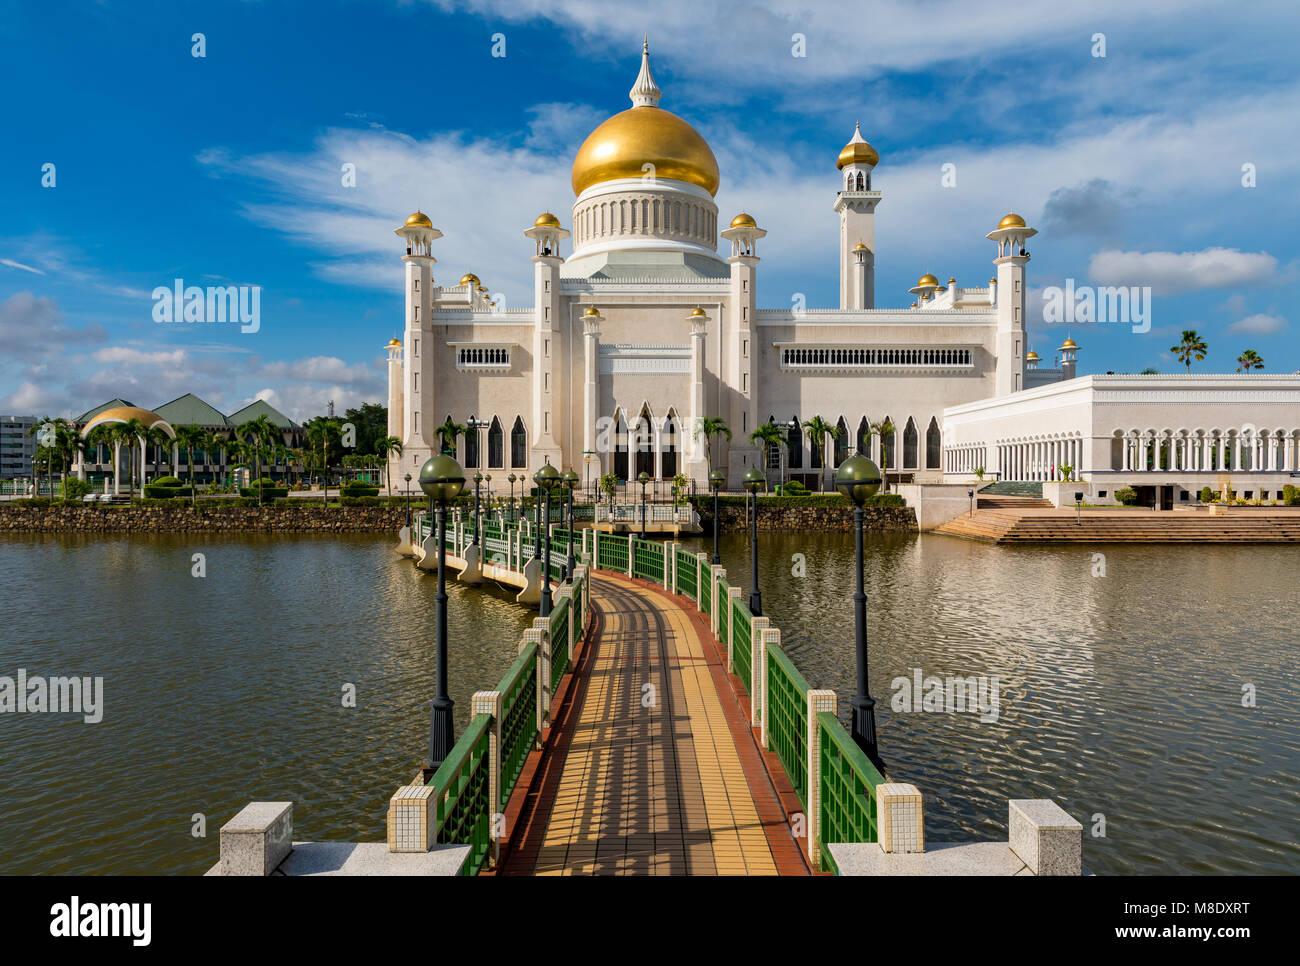 Brunei Darussalam Bandar Seri Begawan Sultan Omar Ali Saifuddien Mosque March 15, 2018 One of Brunei's most - Stock Image